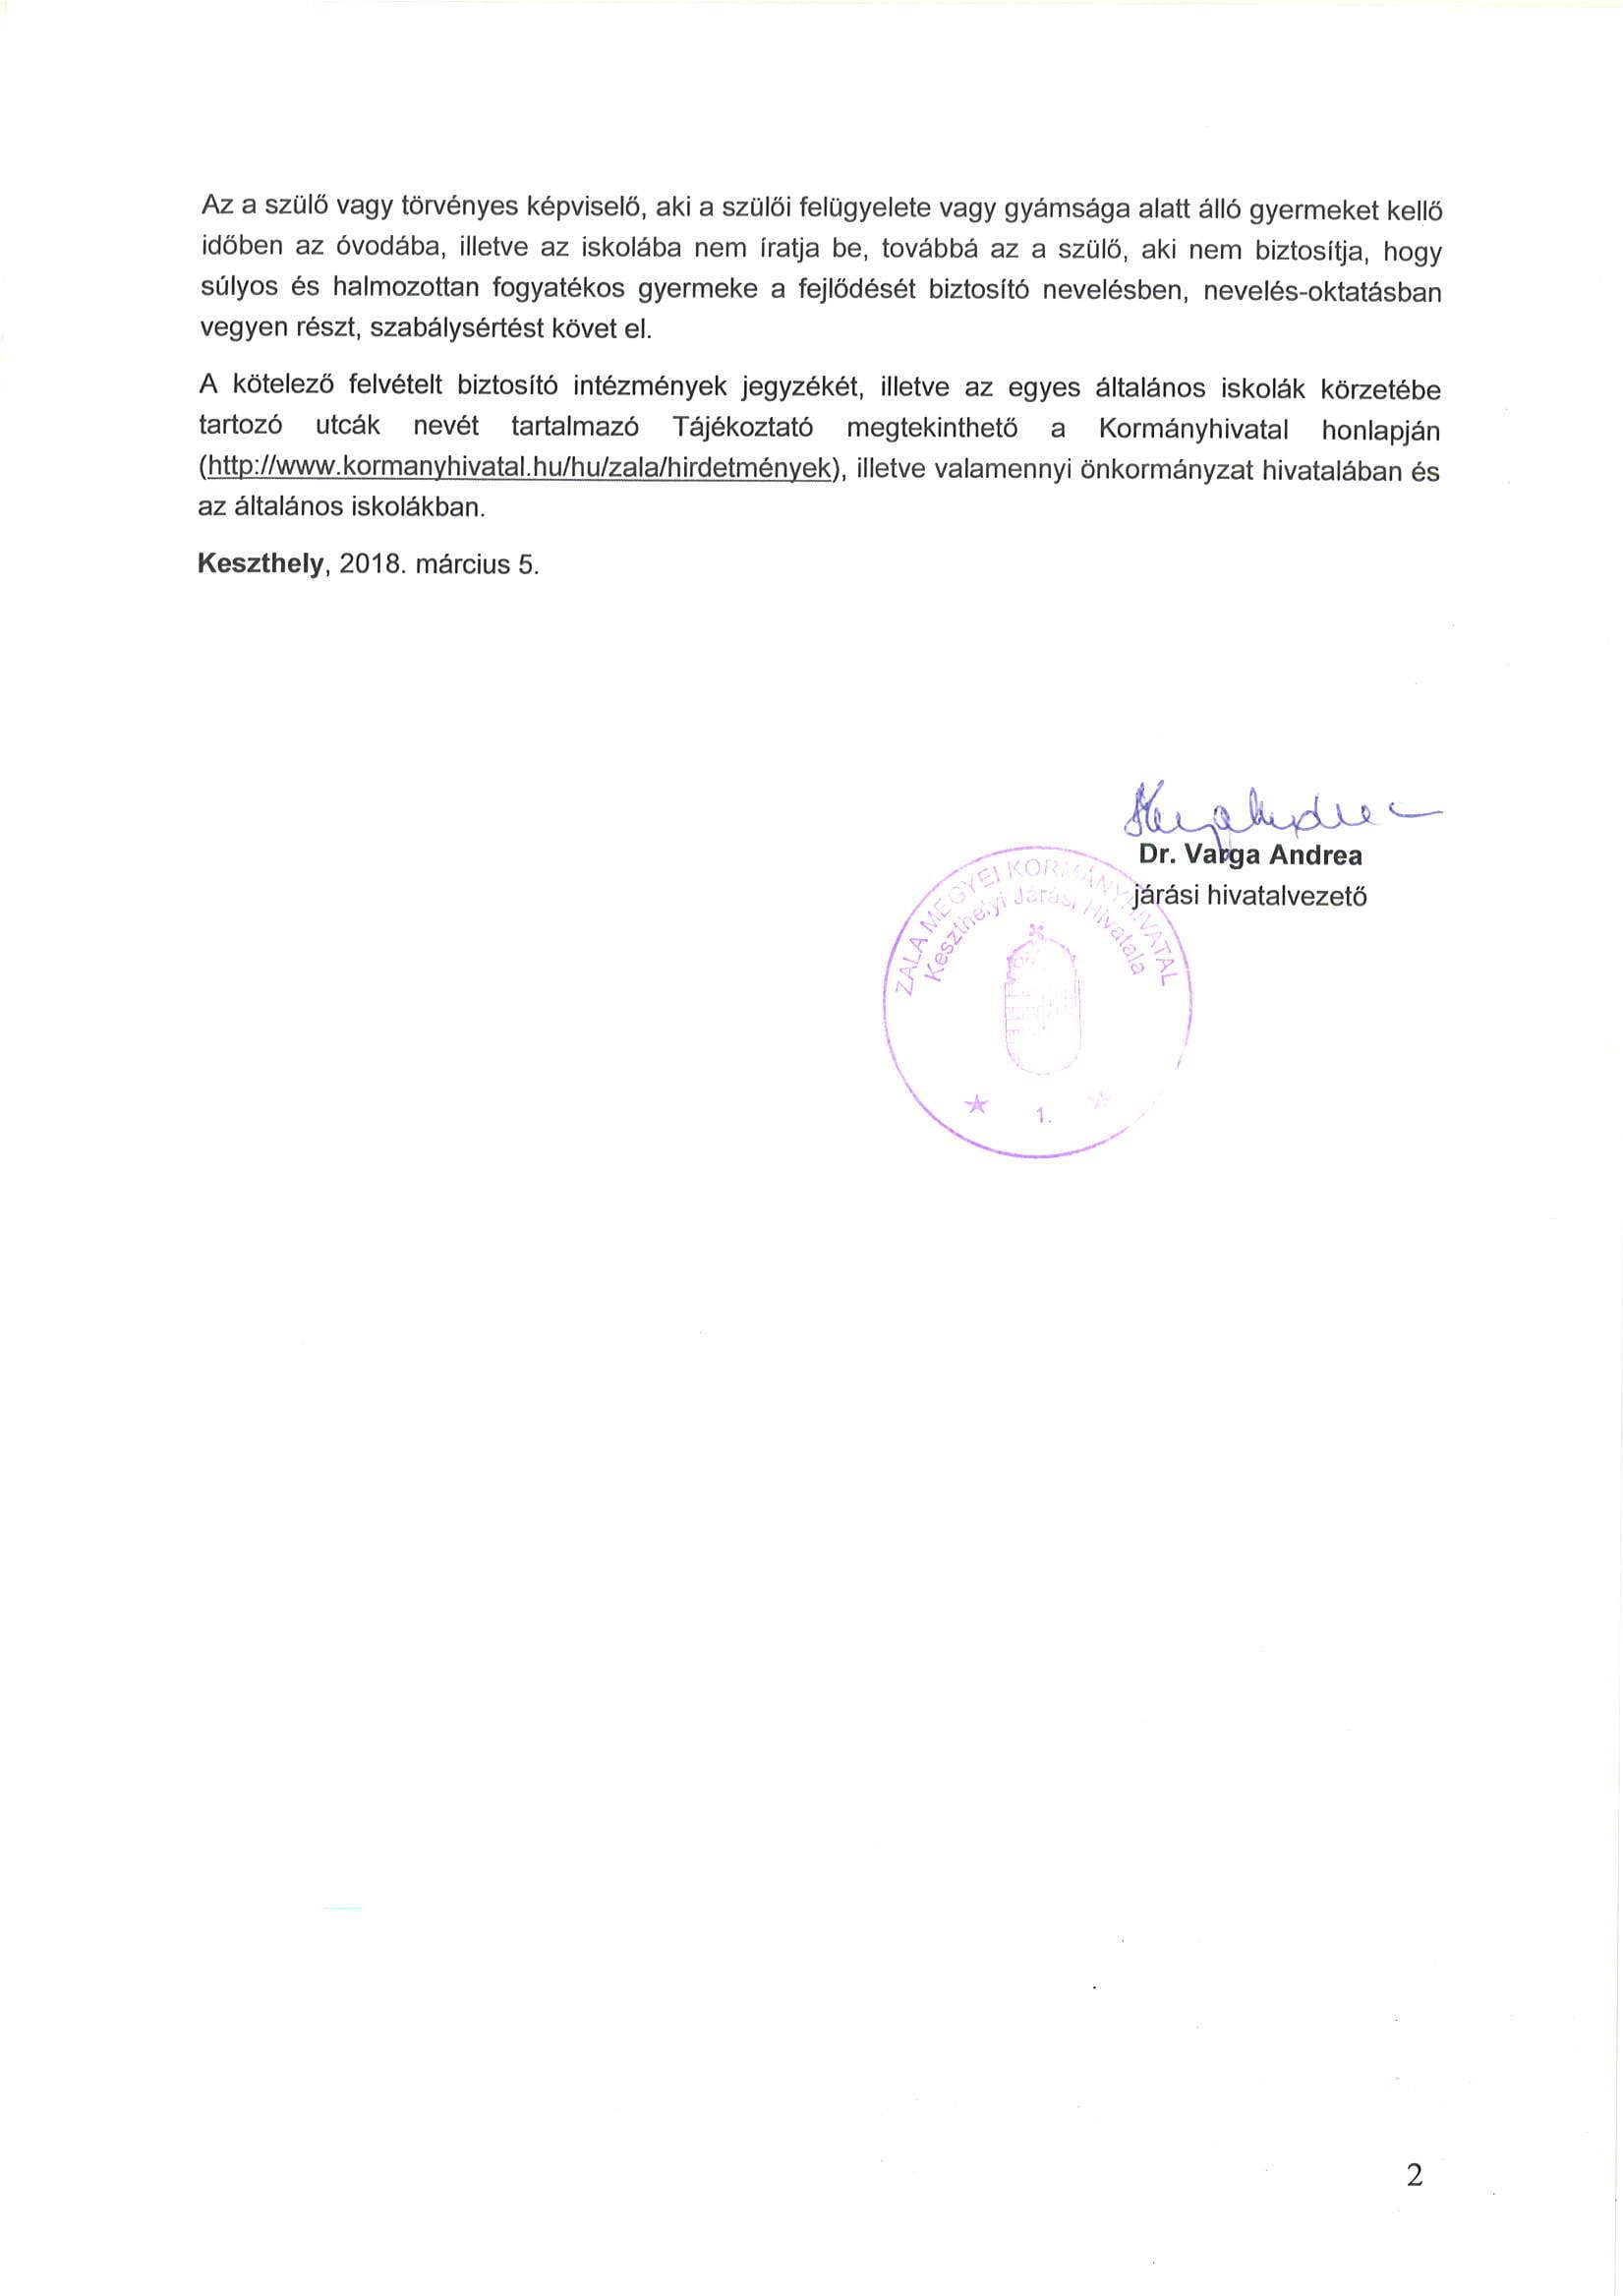 hirdetmeny_2018_19_tanevre_torteno_iskolai_beiratkozas_rendjerol-2.jpg